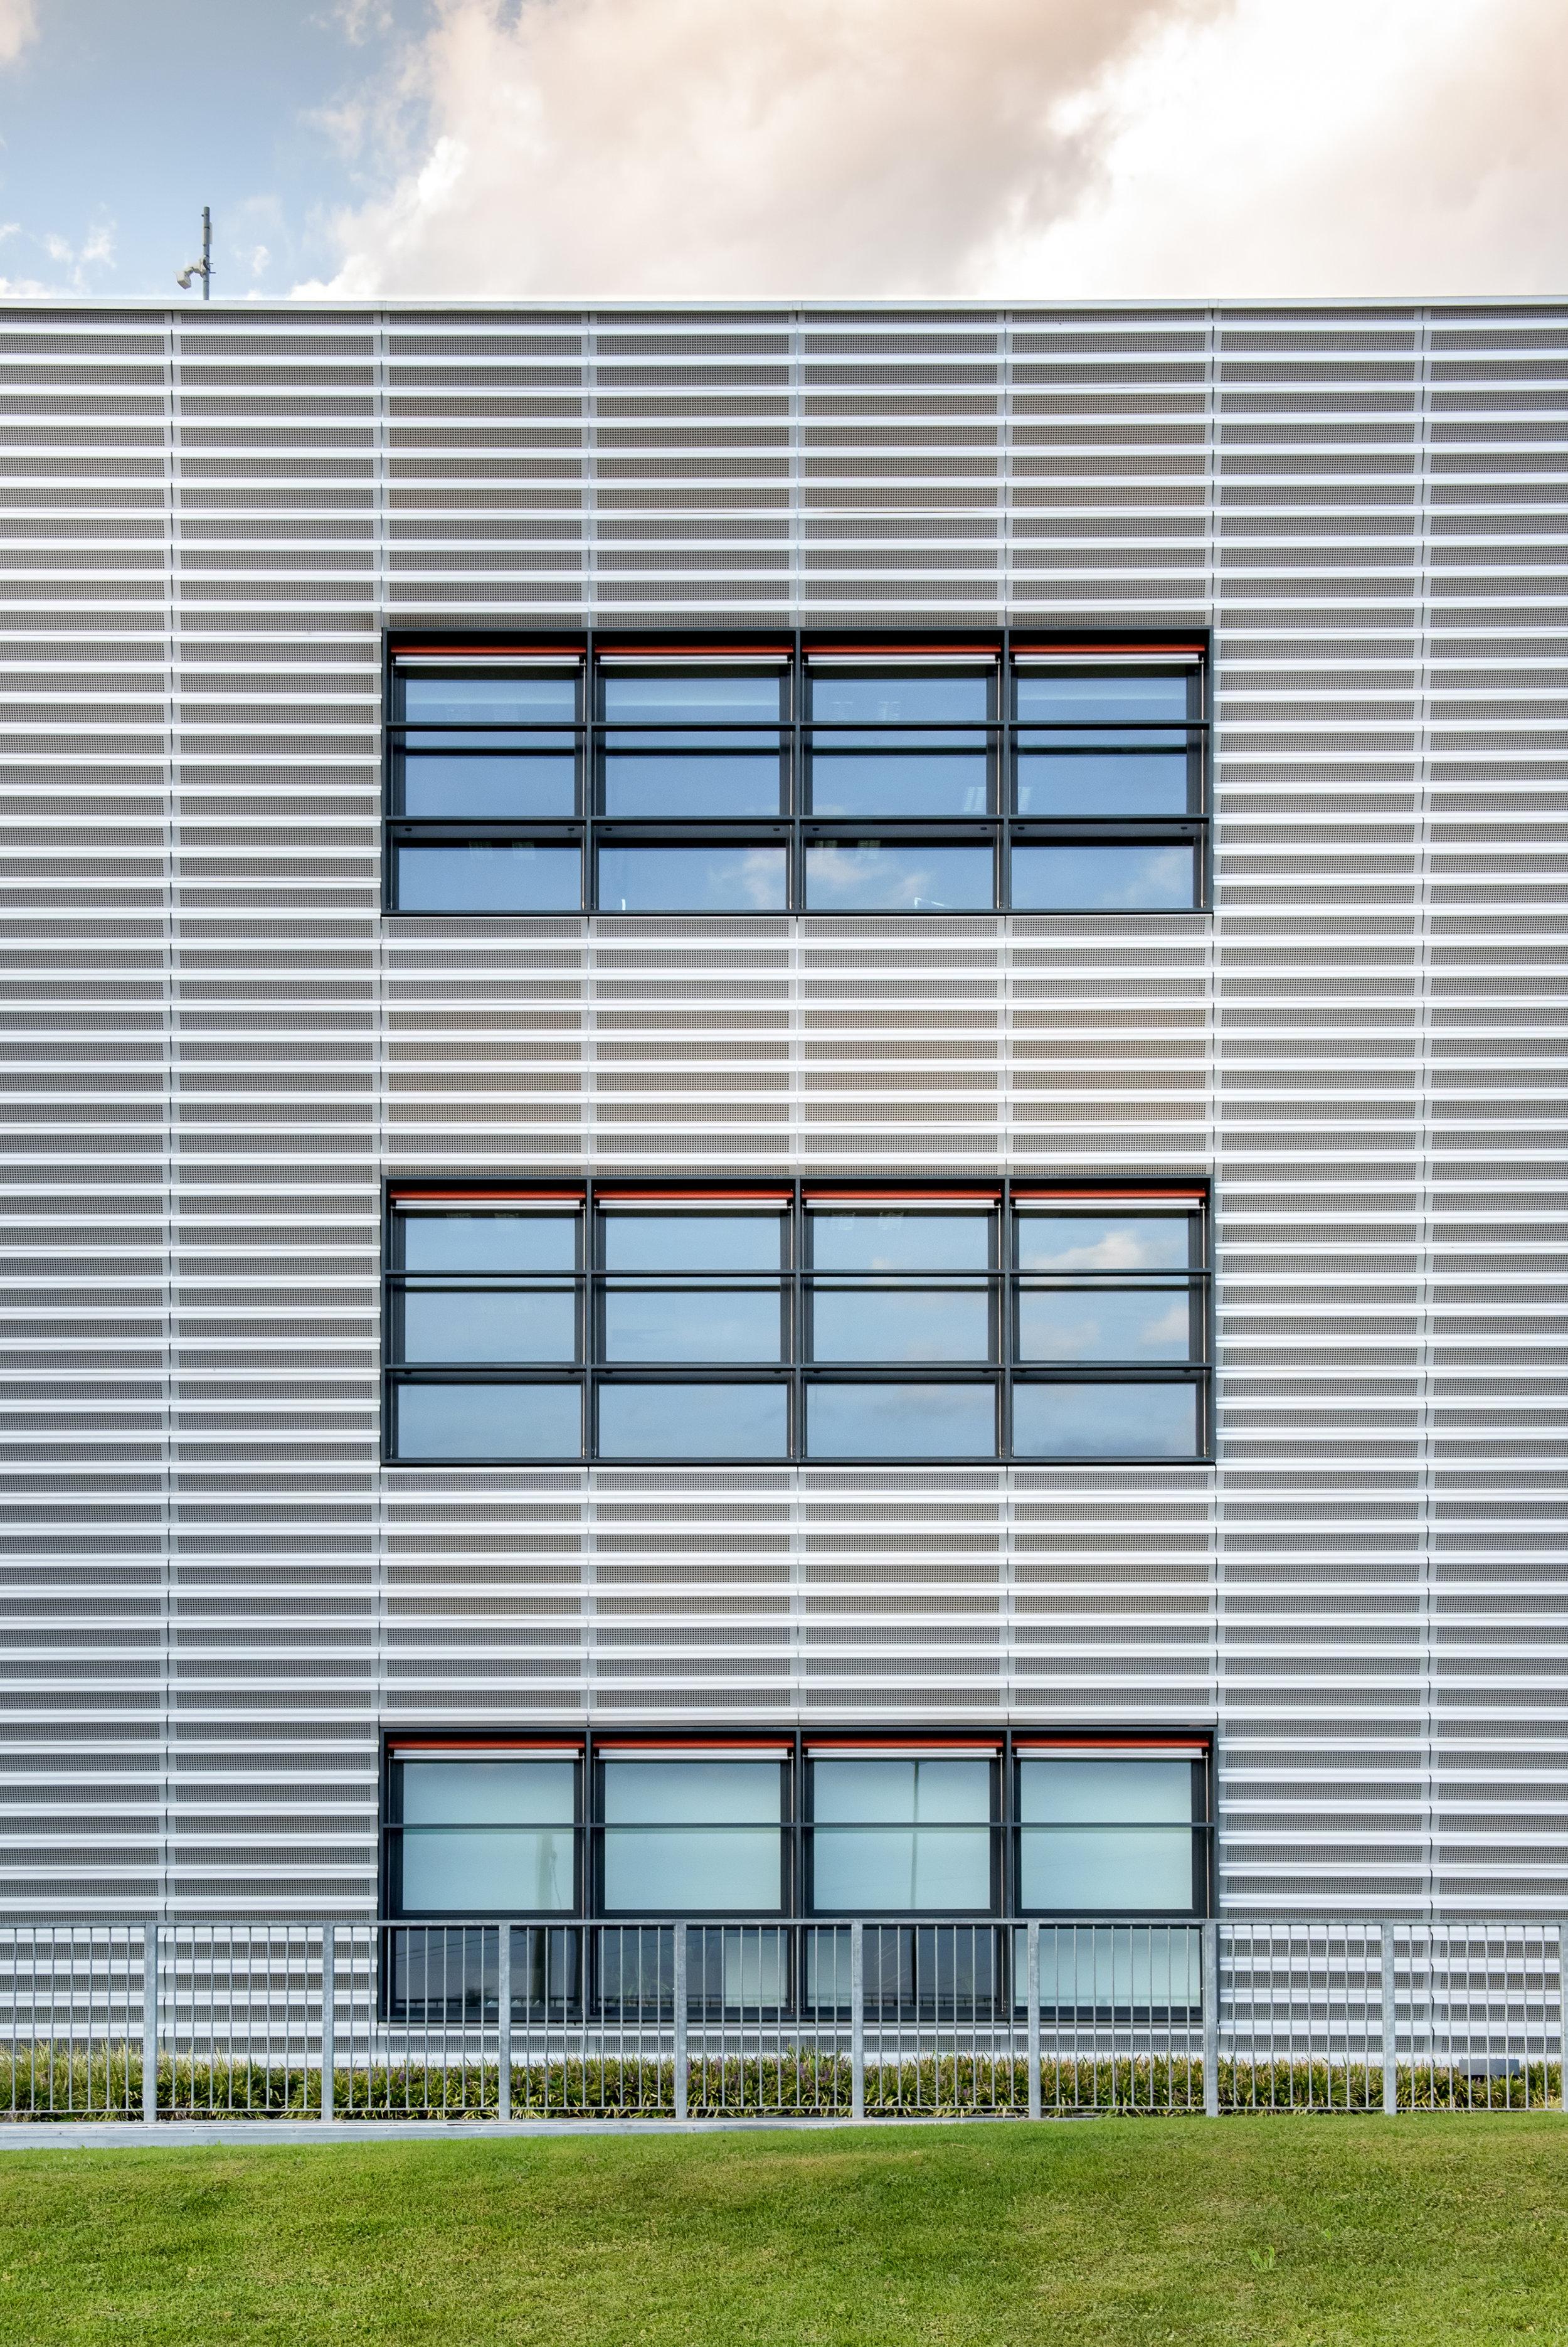 symmetrical-view-of-a-modern-commercial-building-5YB4SFW.jpg